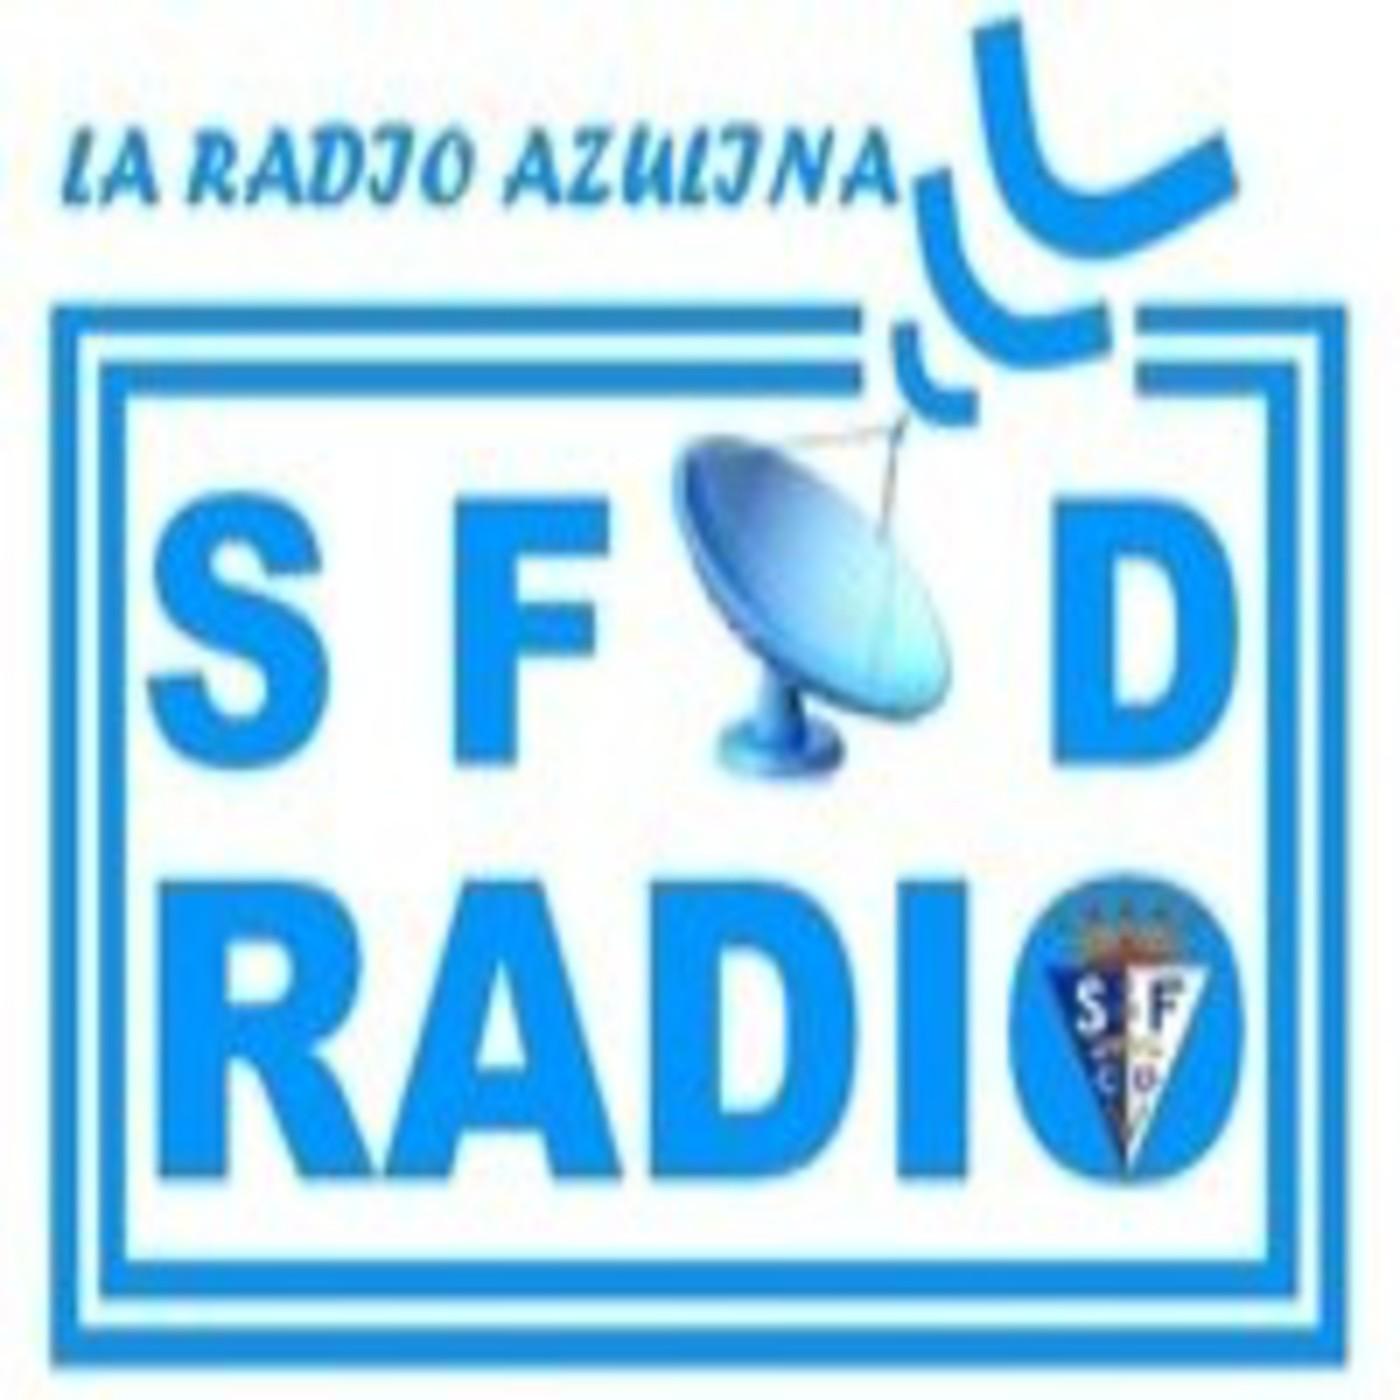 Escucha El Canal Radio Oficial San Fernando Cd Ivoox